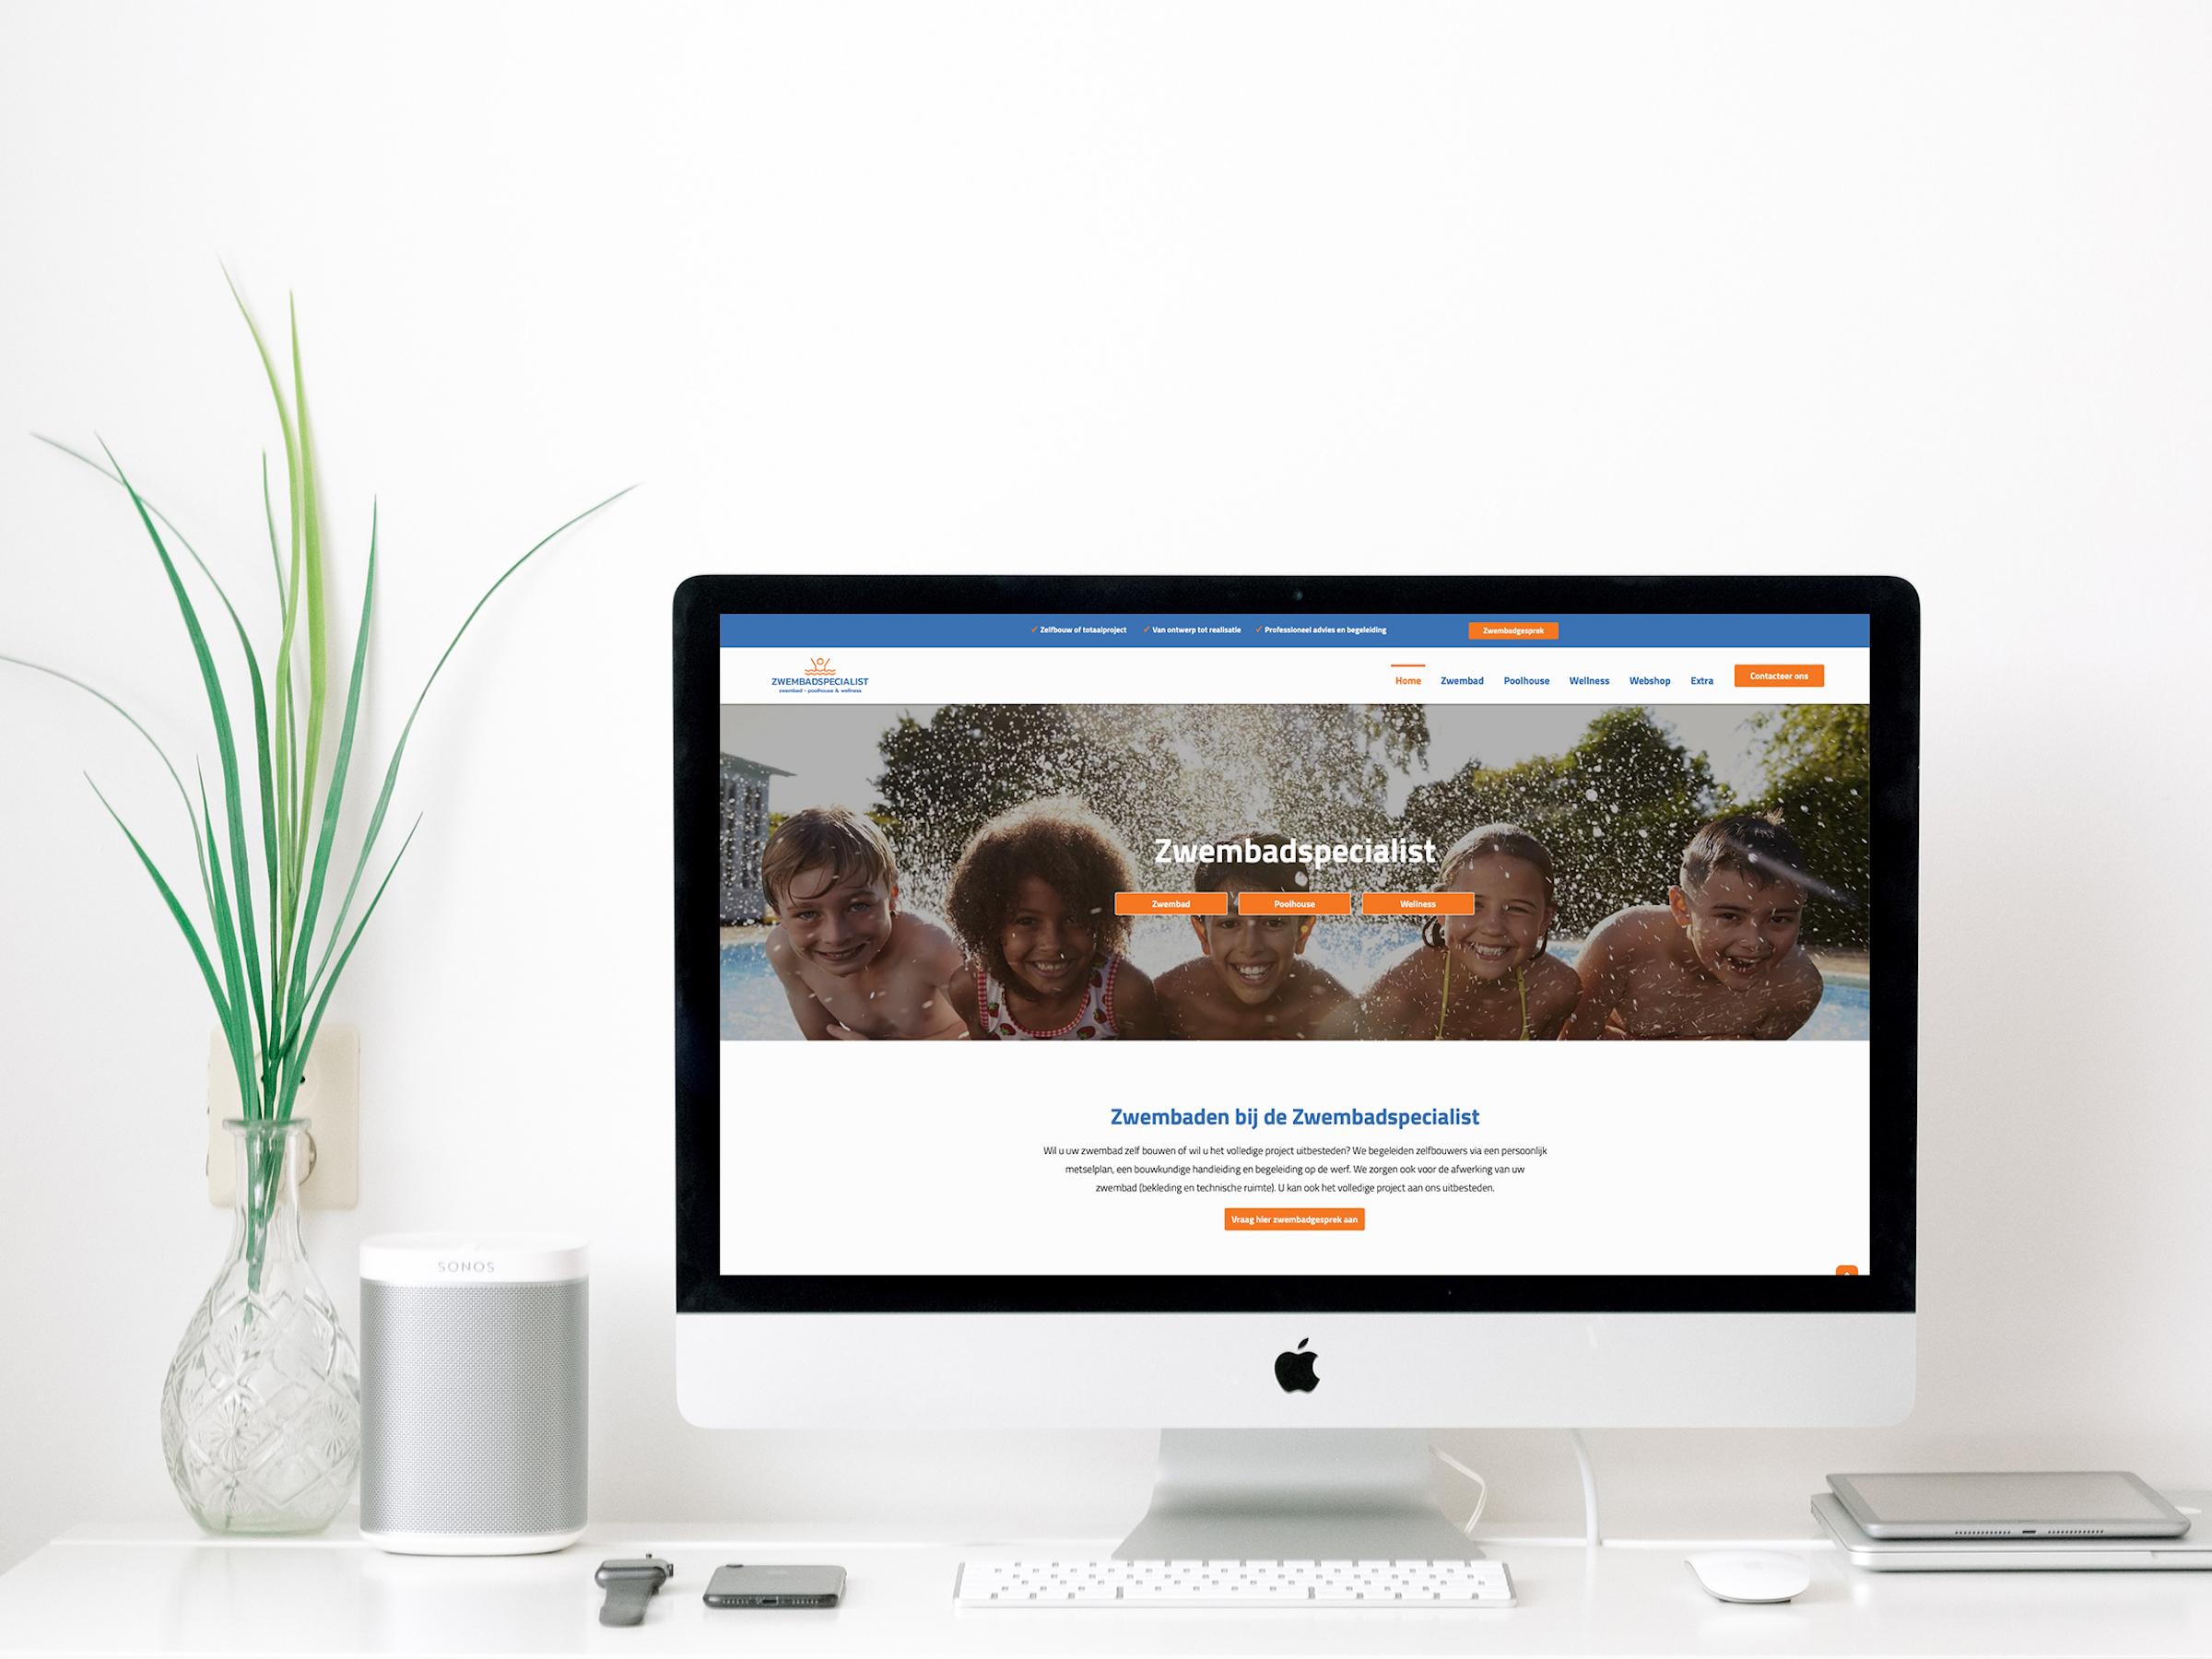 Zwembadspecialist ➡️ Webdesign ➡️ Webshop ➡️ Mobielvriendelijk